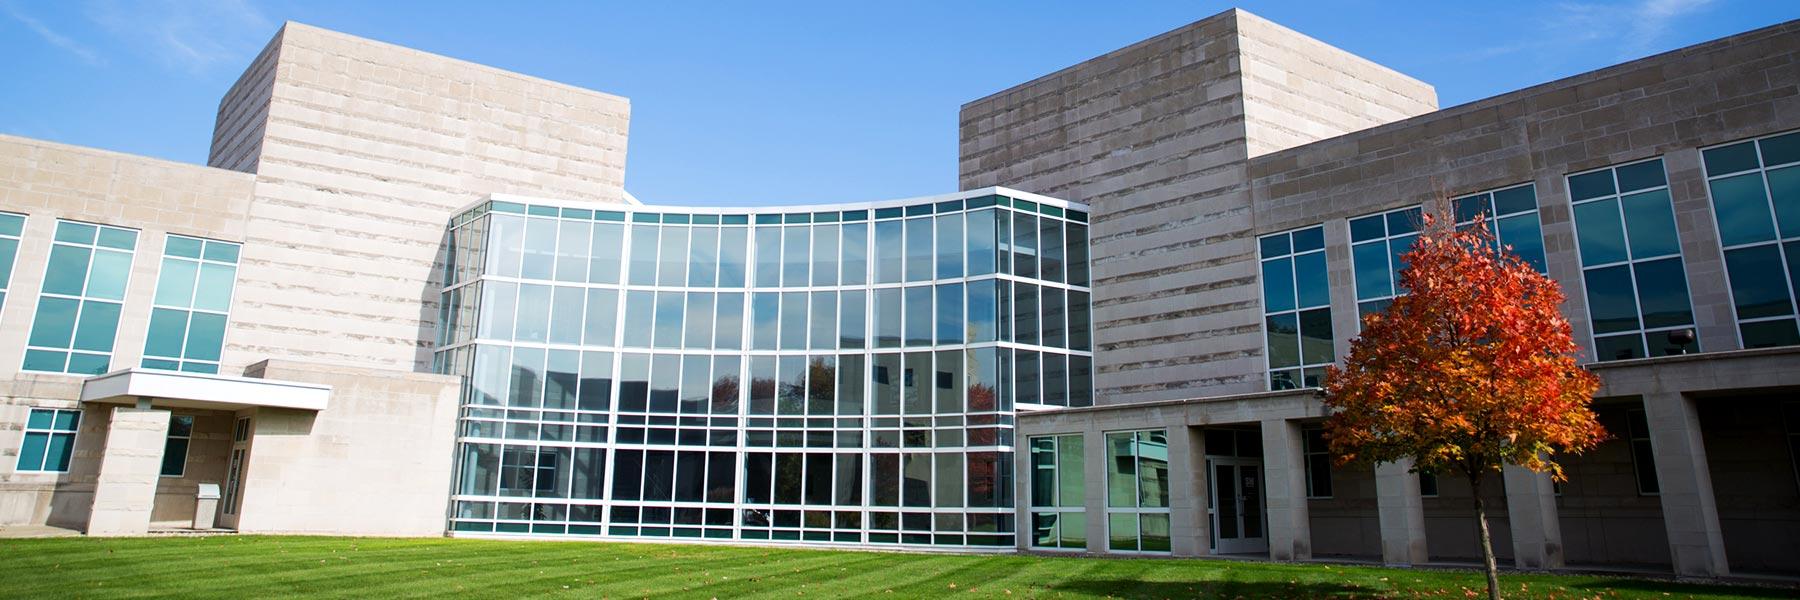 Iupui Calendar 2022.Meeting Schedule Future Dates Meetings Minutes Board Of Trustees Indiana University